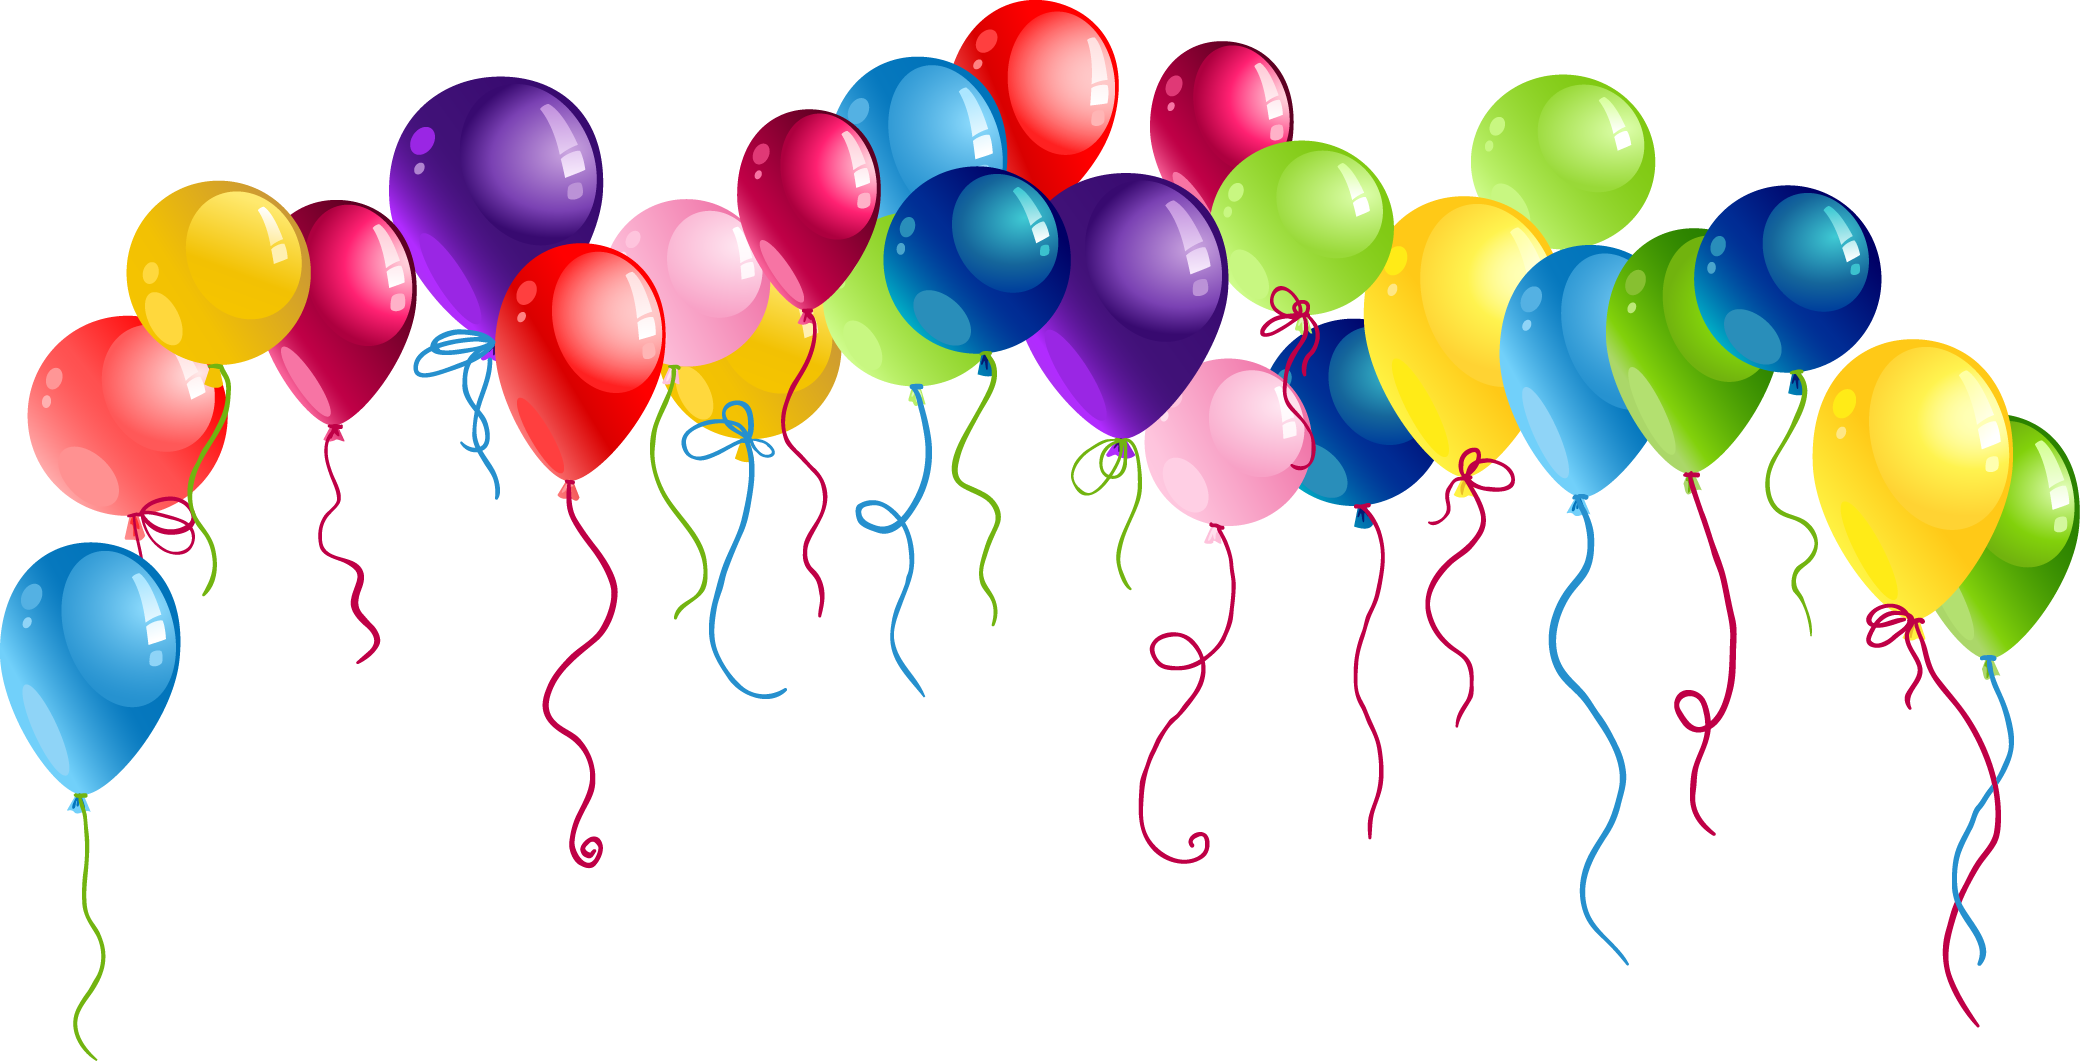 https://www.clipartmax.com/png/full/46-463525_clipart-ballon-anniversaire-palloncini-immagini.png